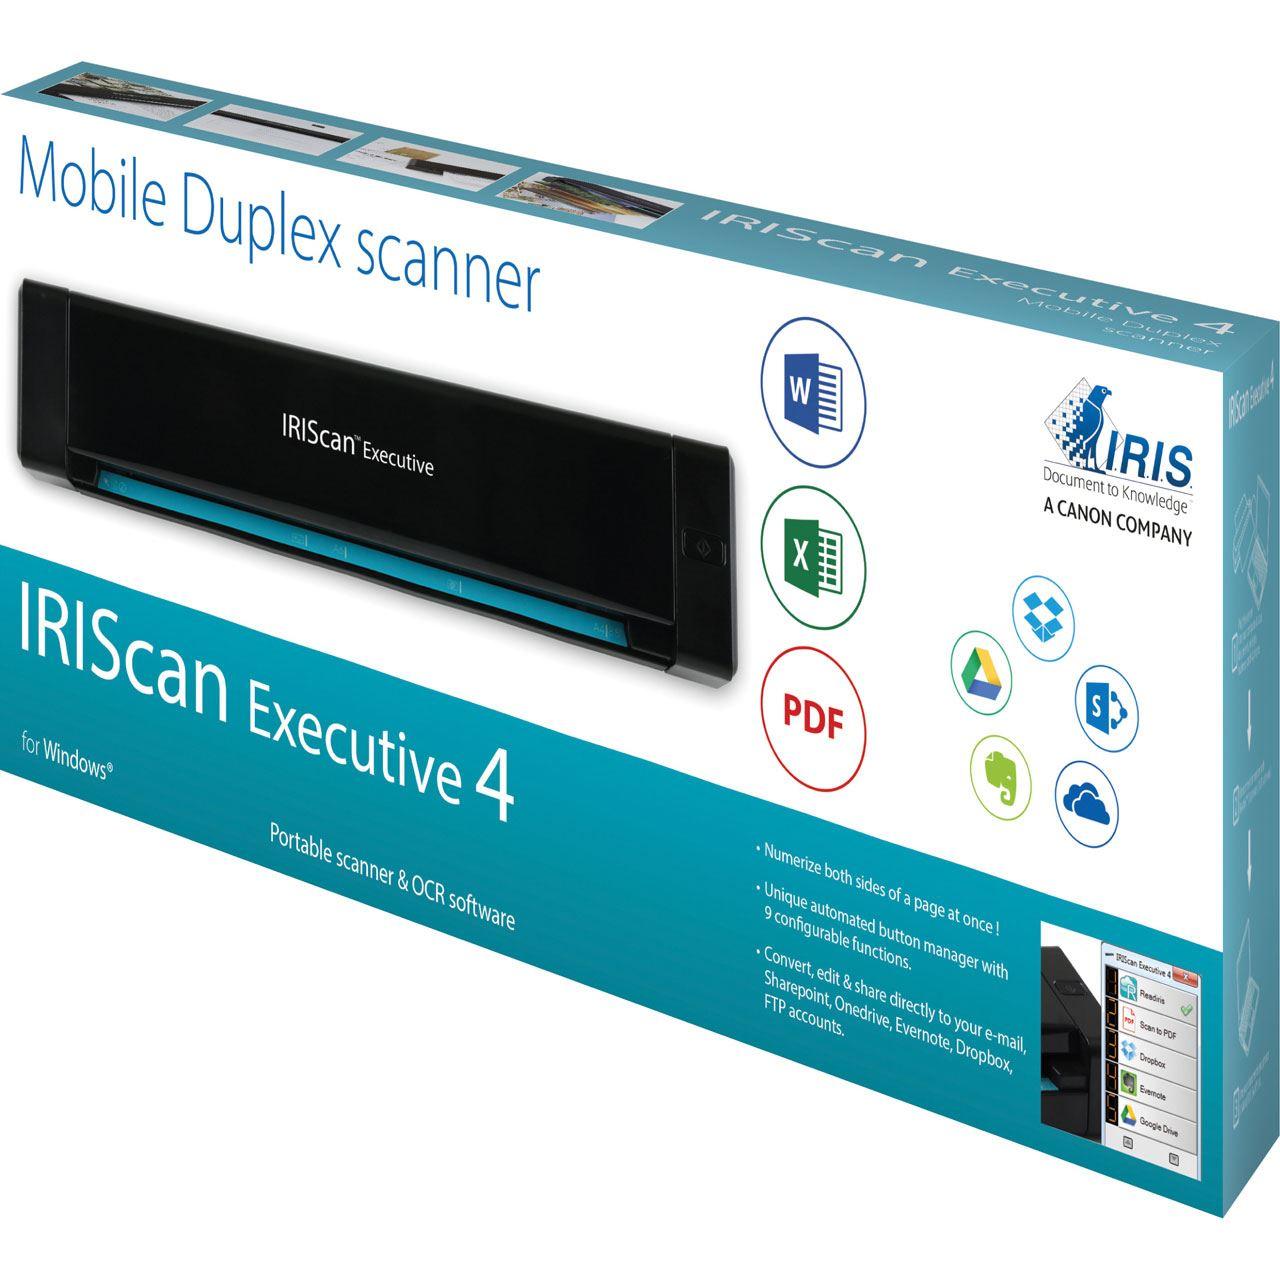 Iris Scan Executive 4 Duplex Scanner